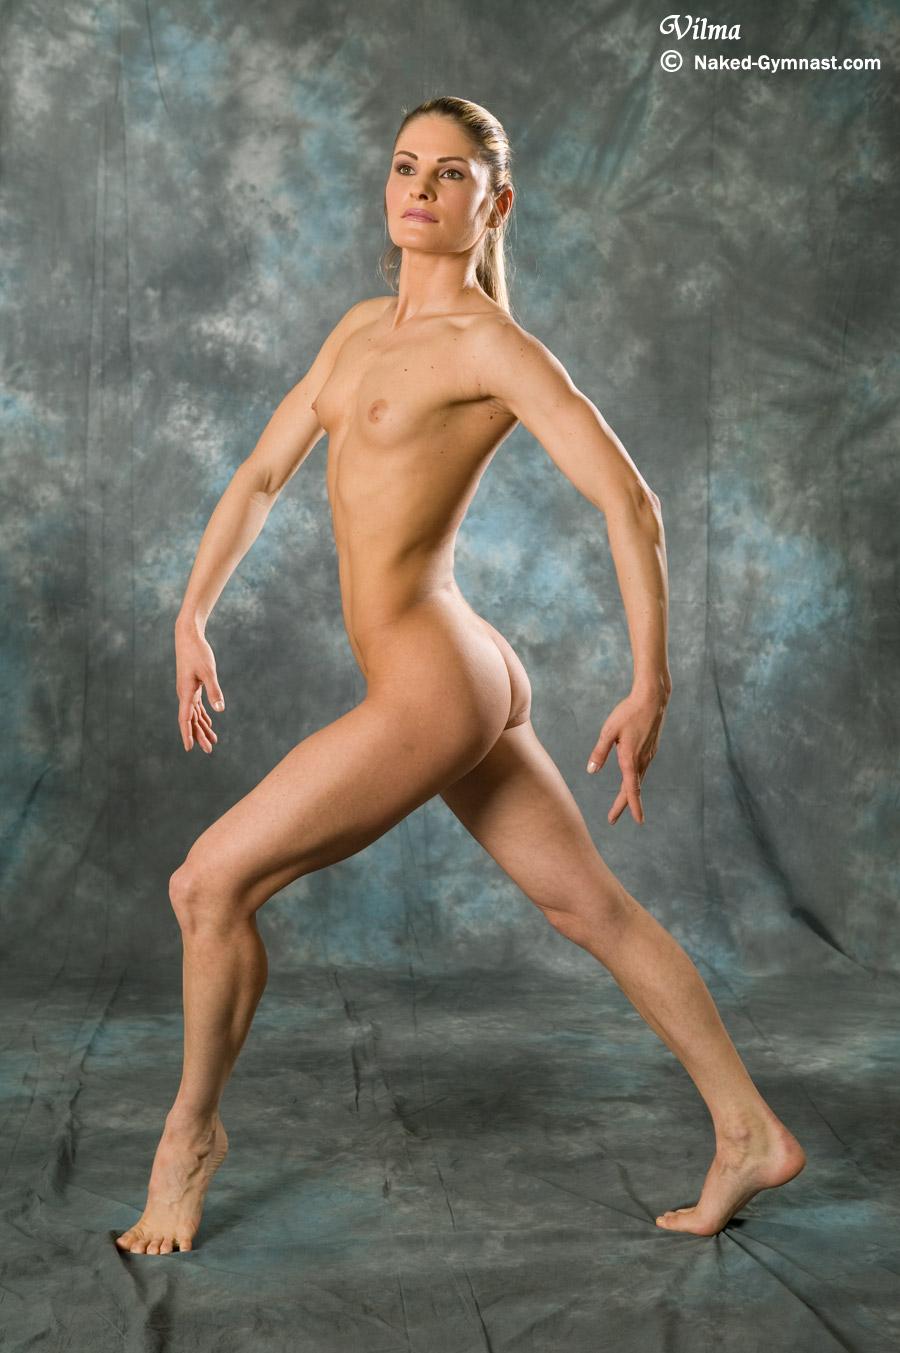 hot naked gymnast girls